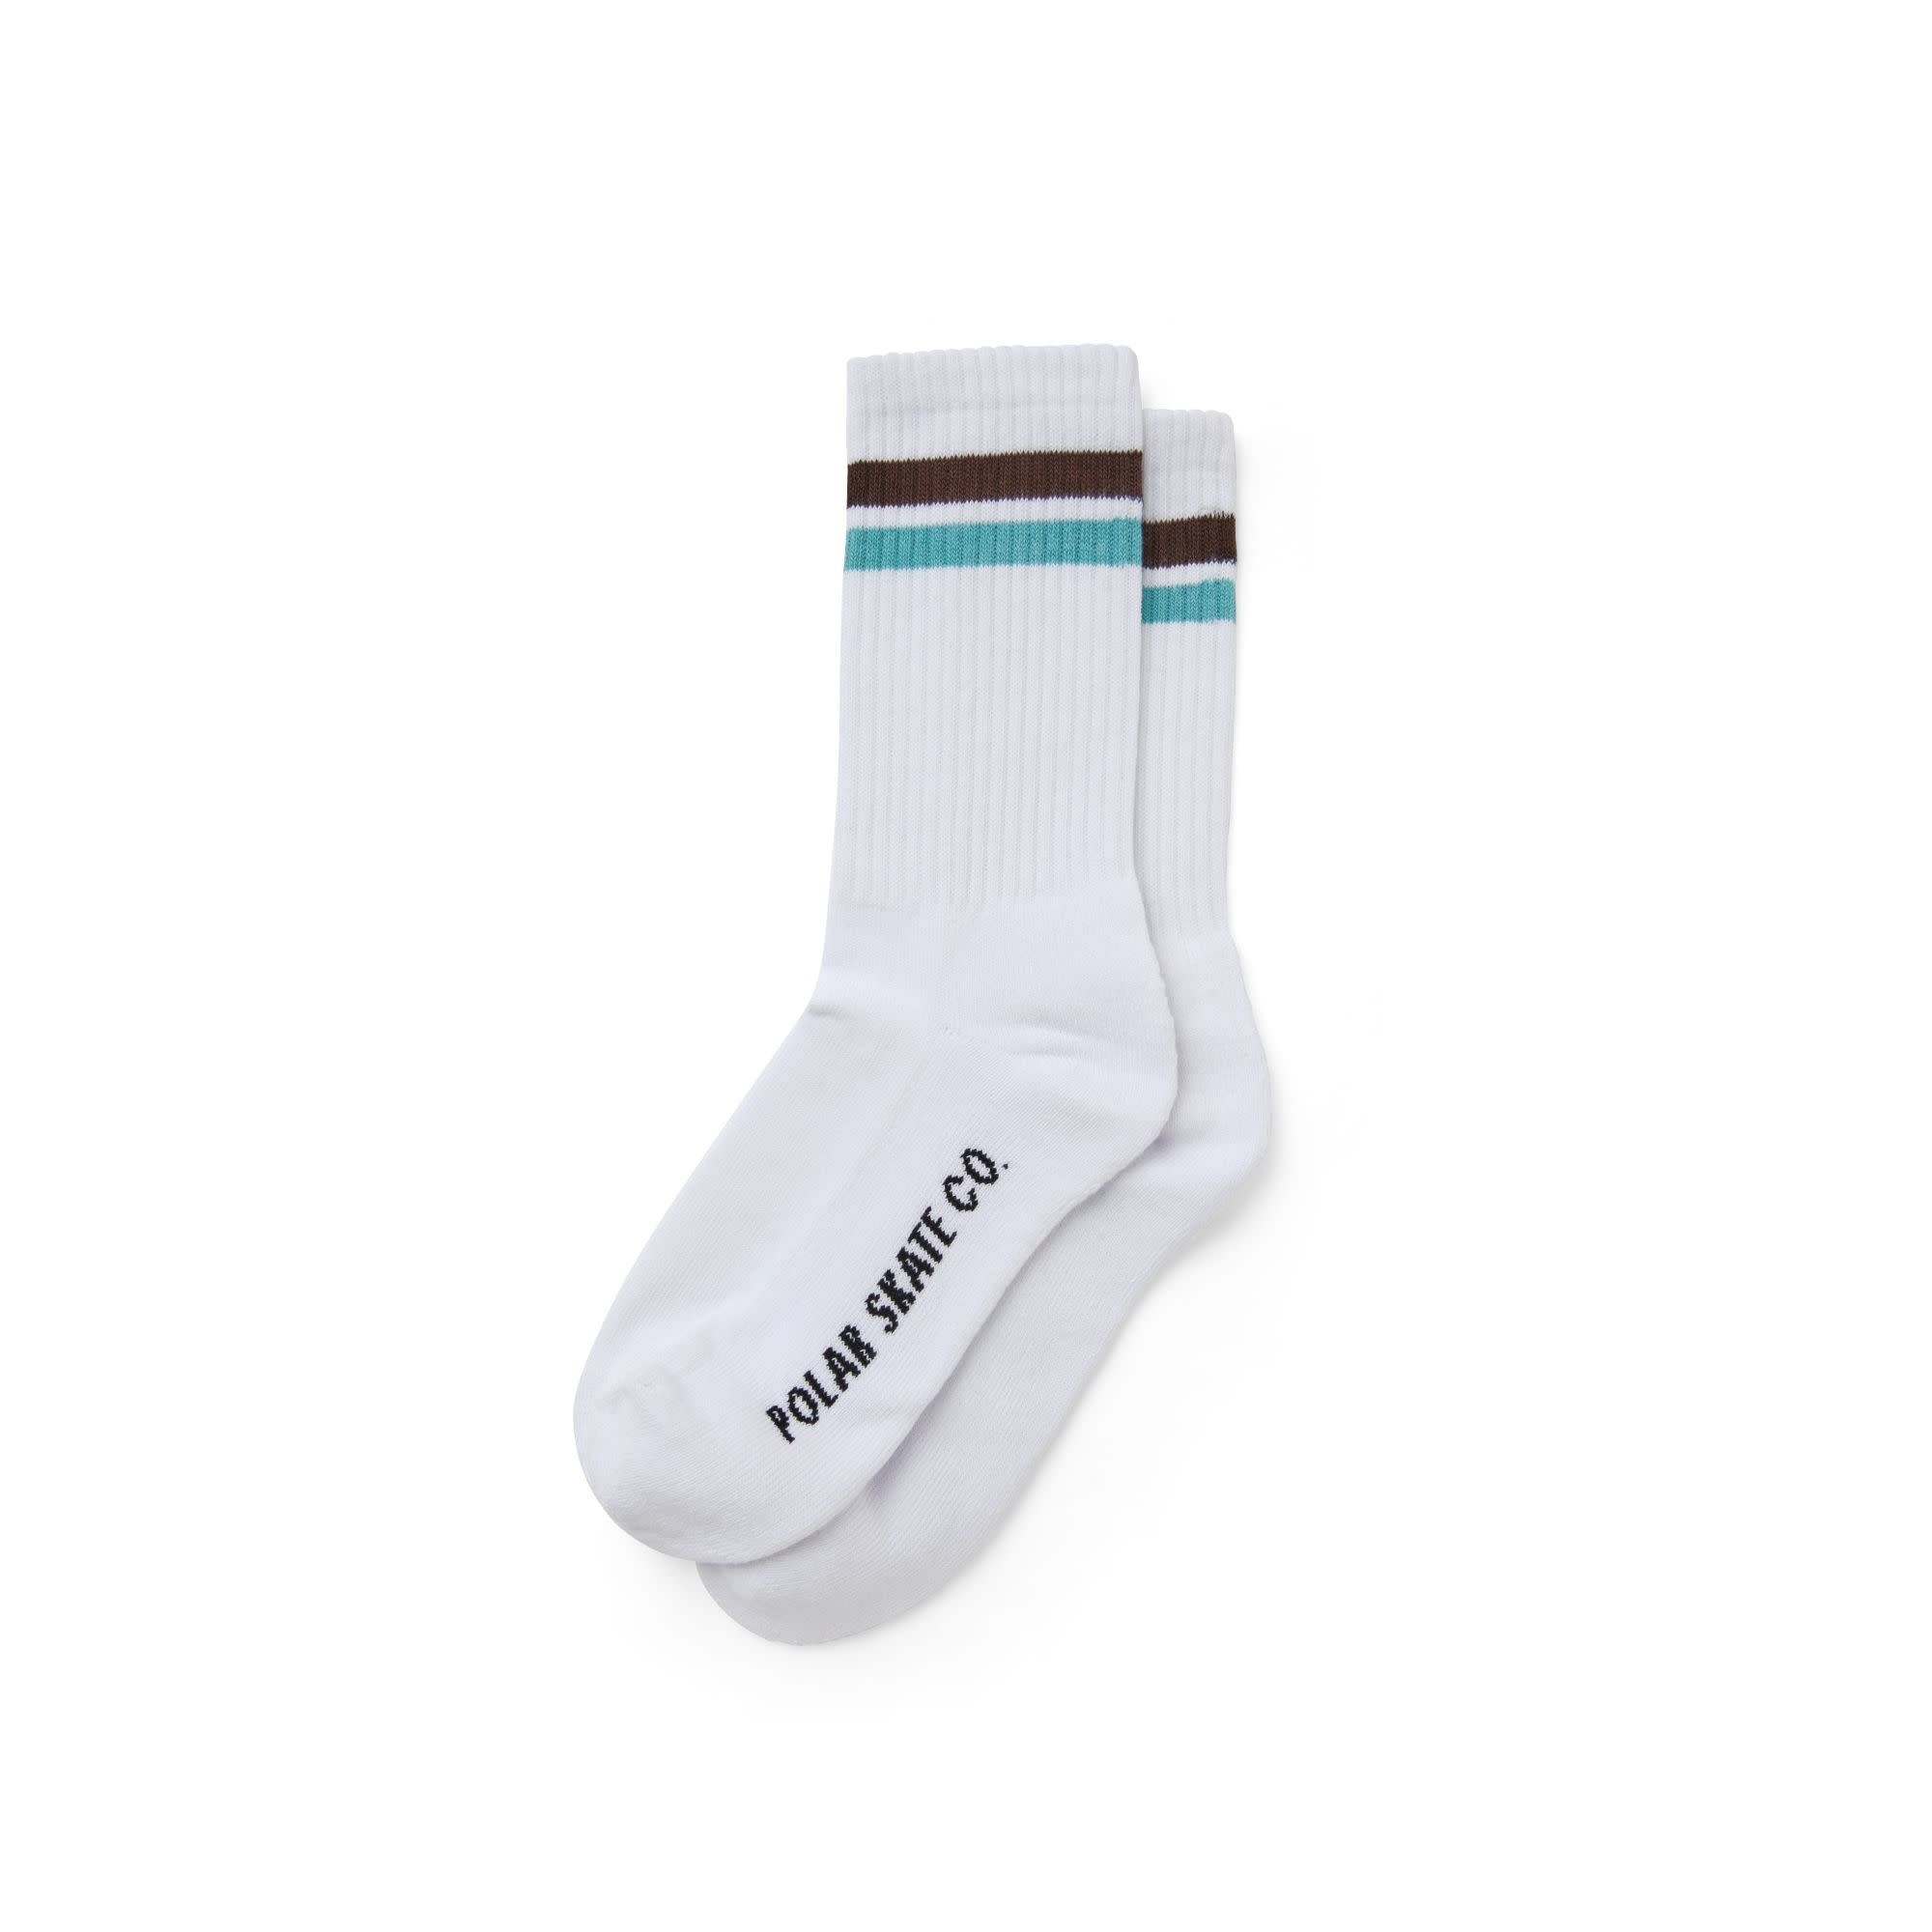 Polar Skate Co. Stripe Socks White/Brown/Mint 39-42